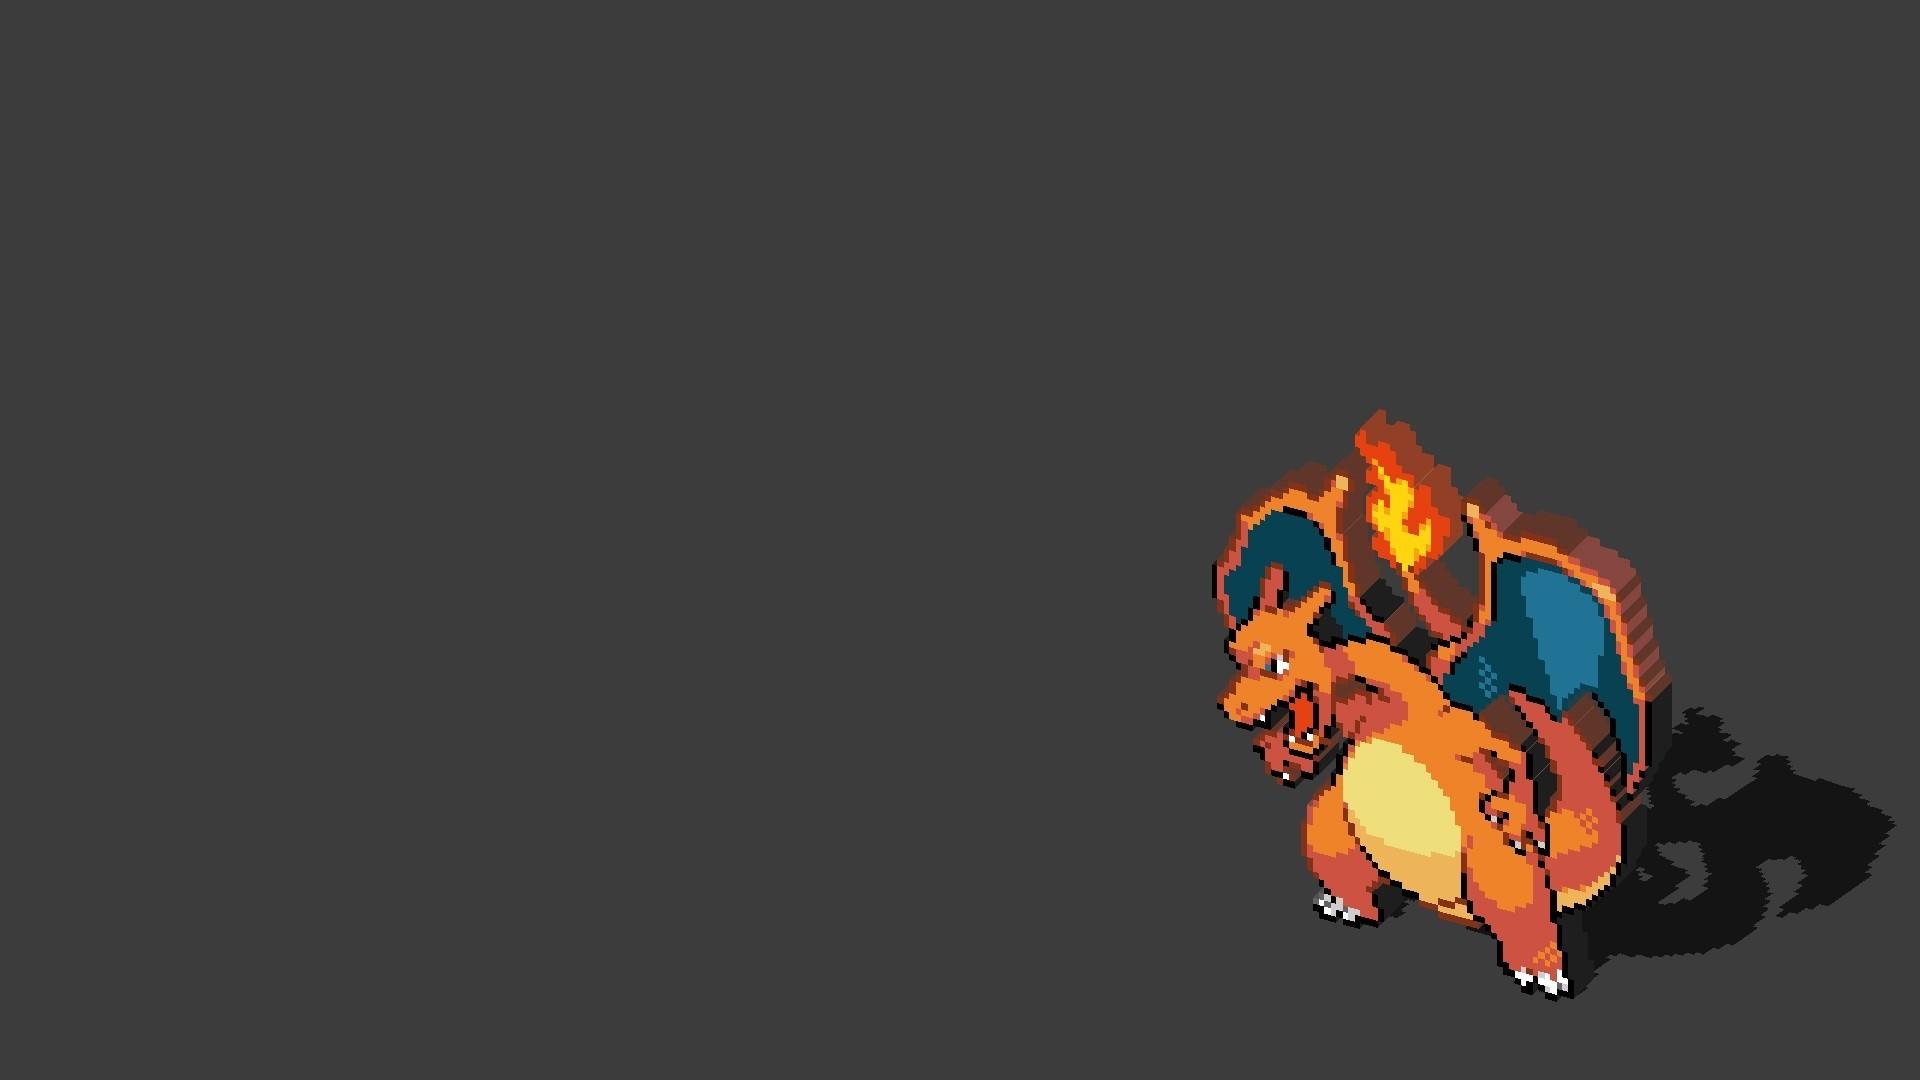 Res: 1920x1080, Pokemon Charizard Wallpaper  Pokemon Charizard